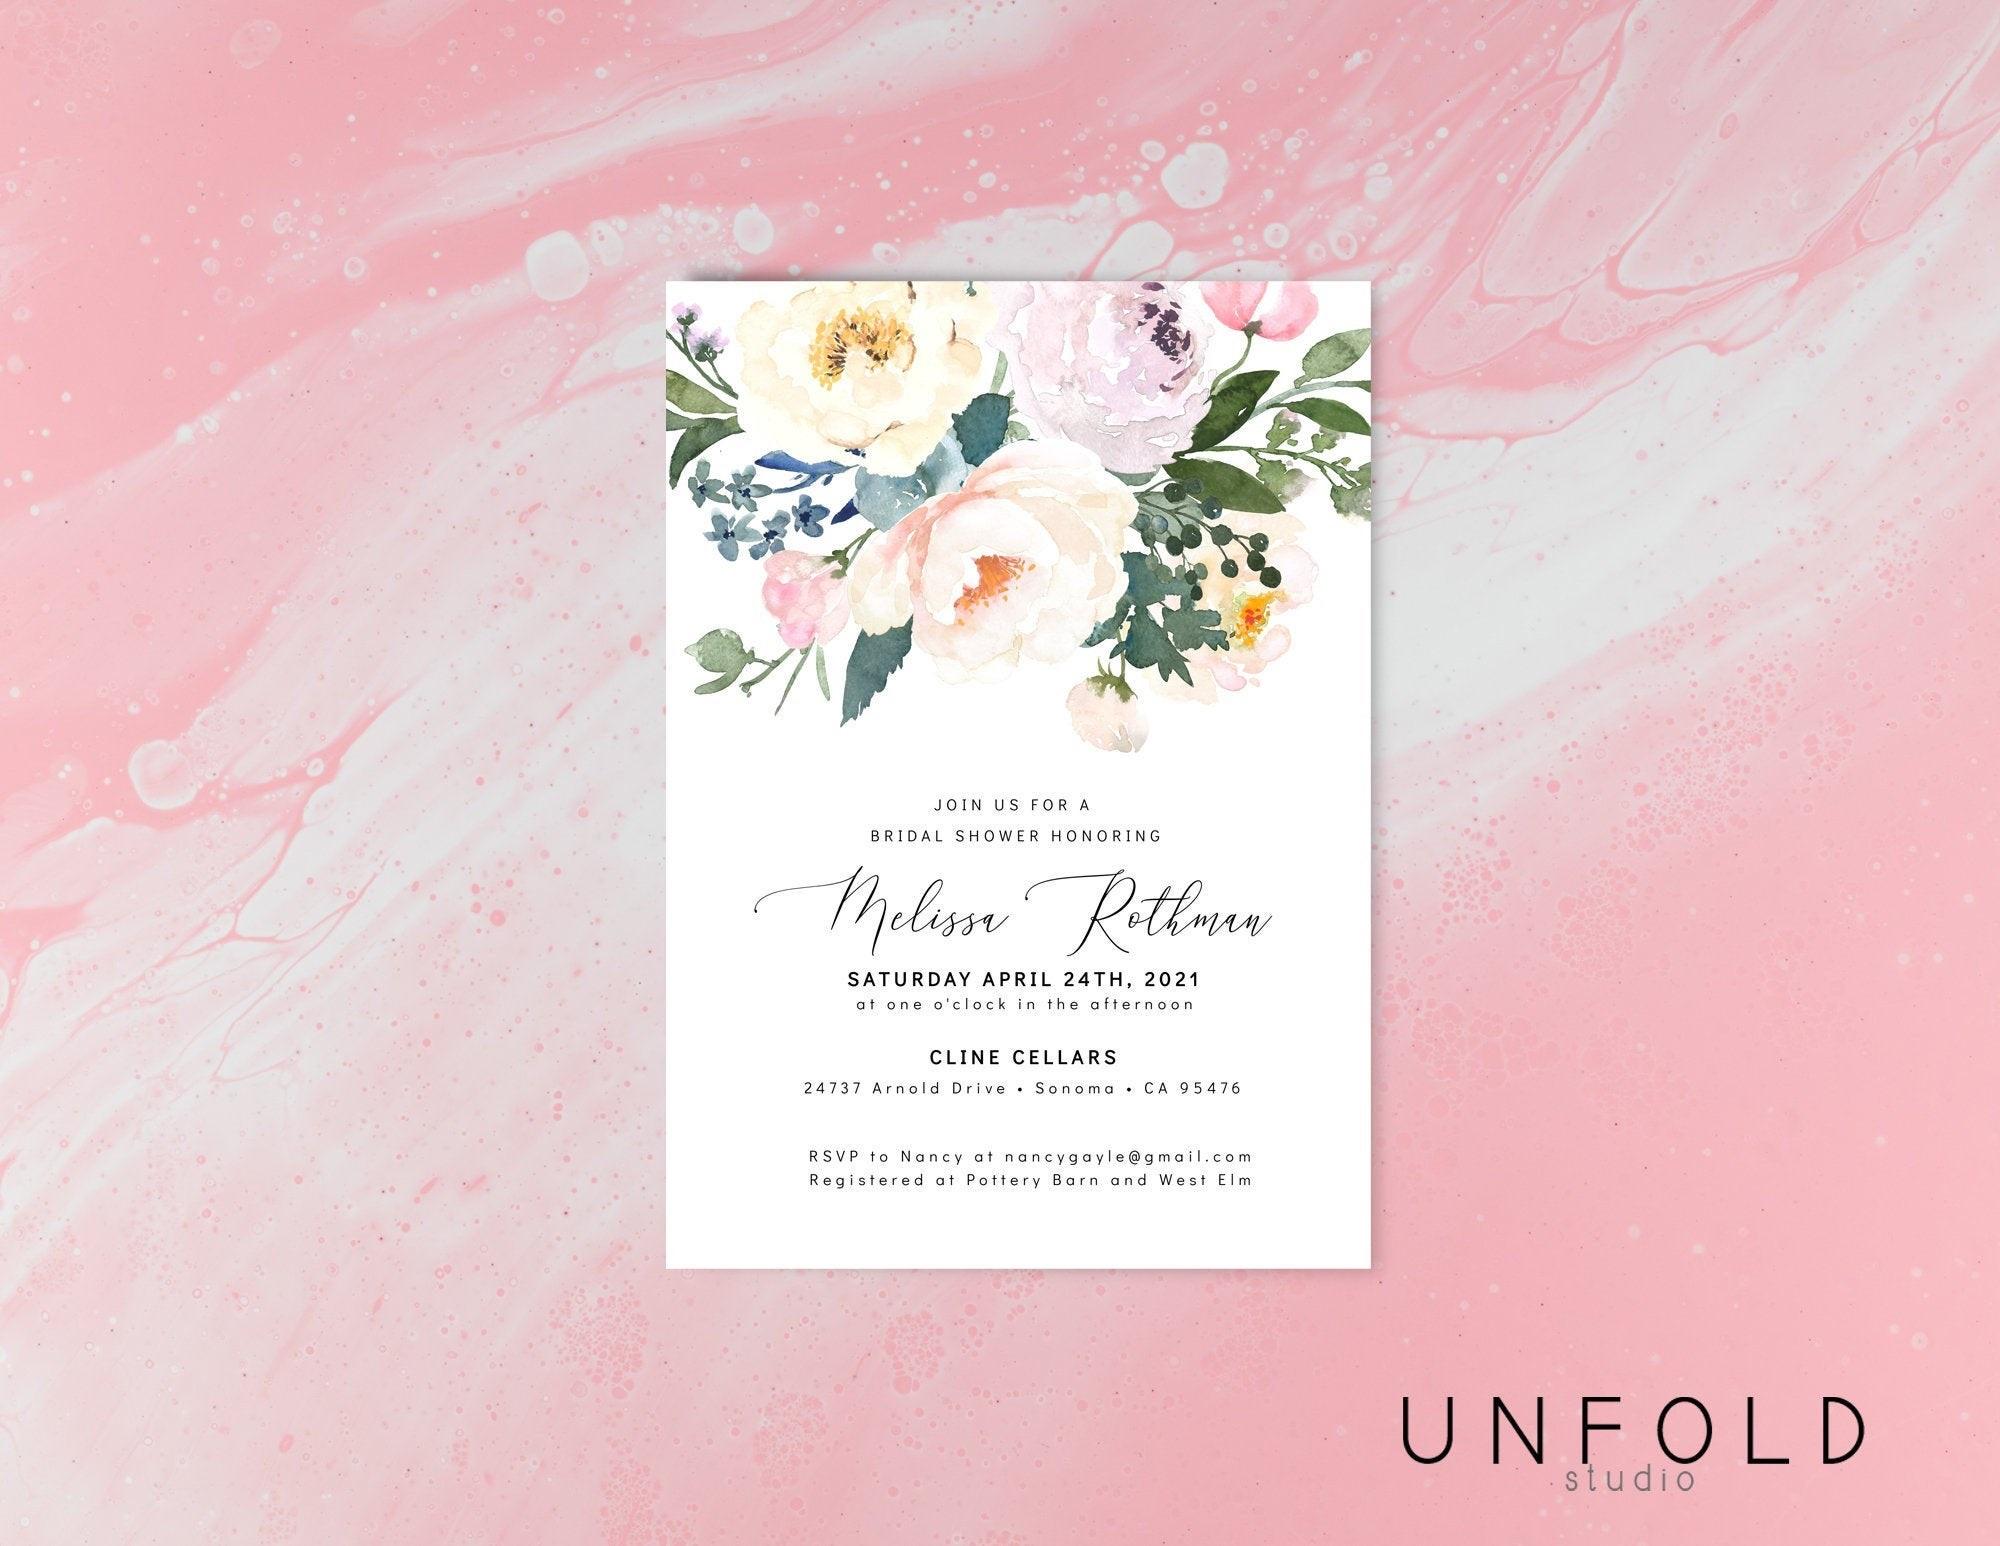 007 Stirring Bridal Shower Card Template Design  Invitation Free Download BingoFull